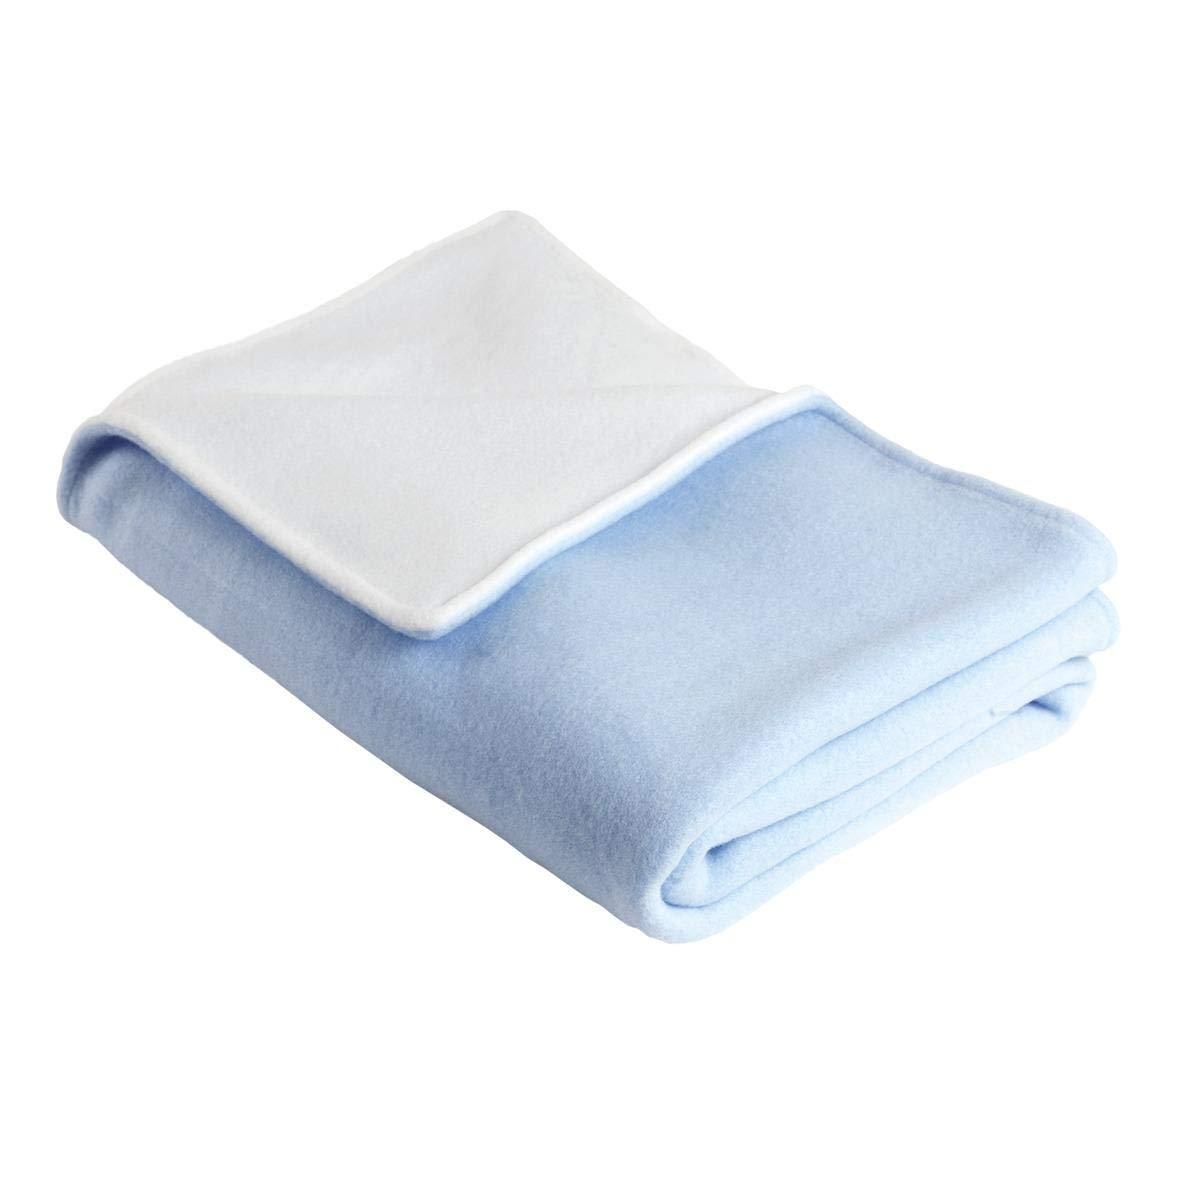 Original Turtle Fur Fleece - Baby Security Blanket, Icicle